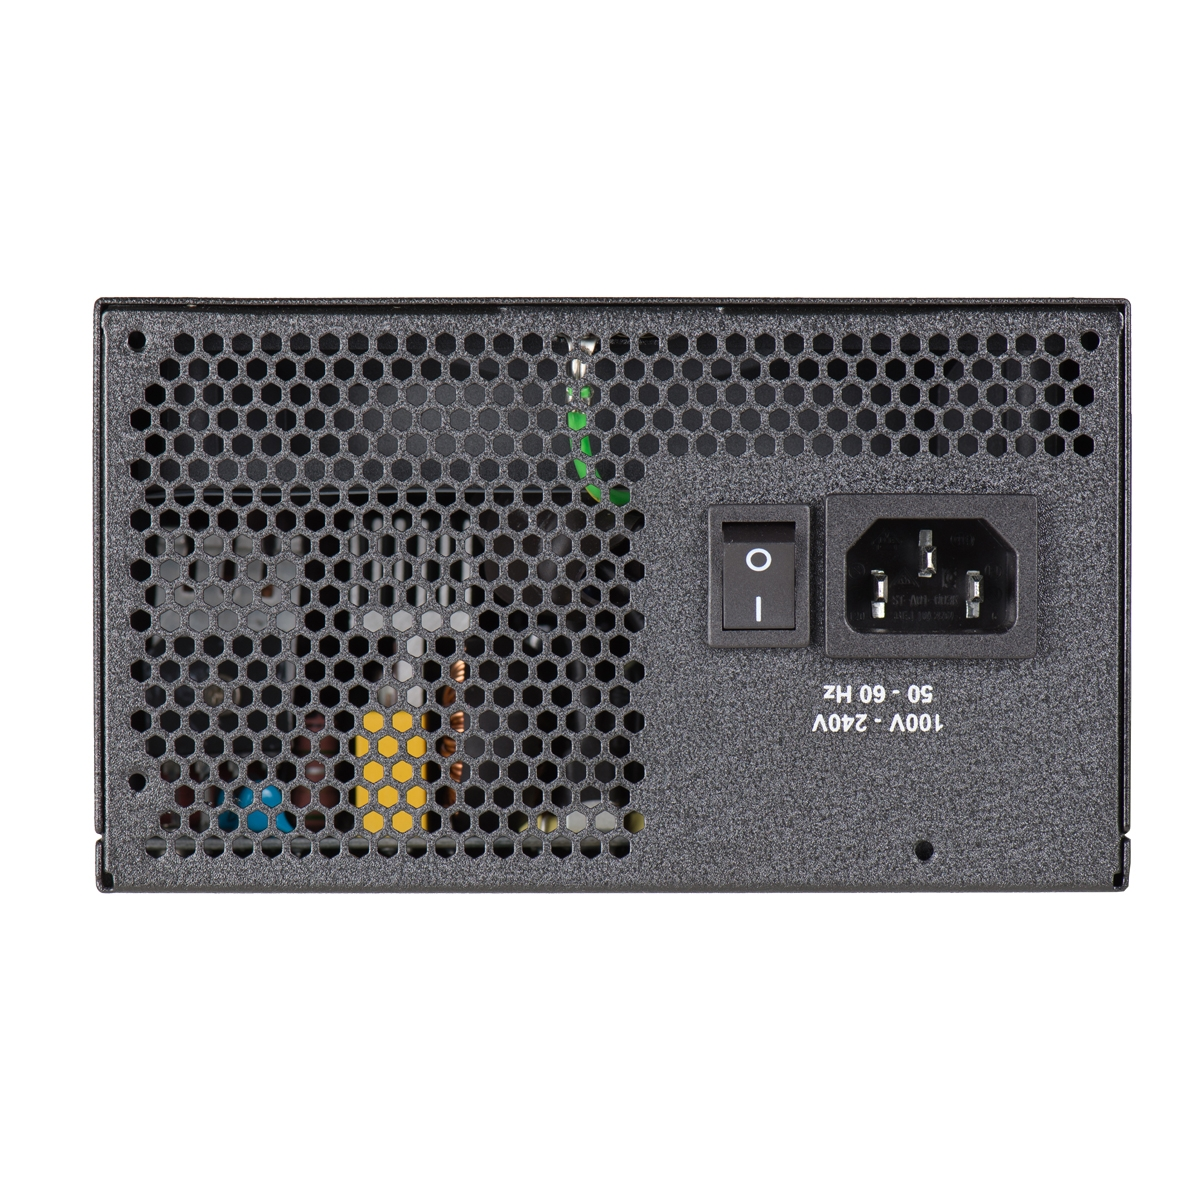 Fonte EVGA 750BQ 750W, 80 Plus Bronze, PFC Ativo, Semi Modular, 110-BQ-0750-V1